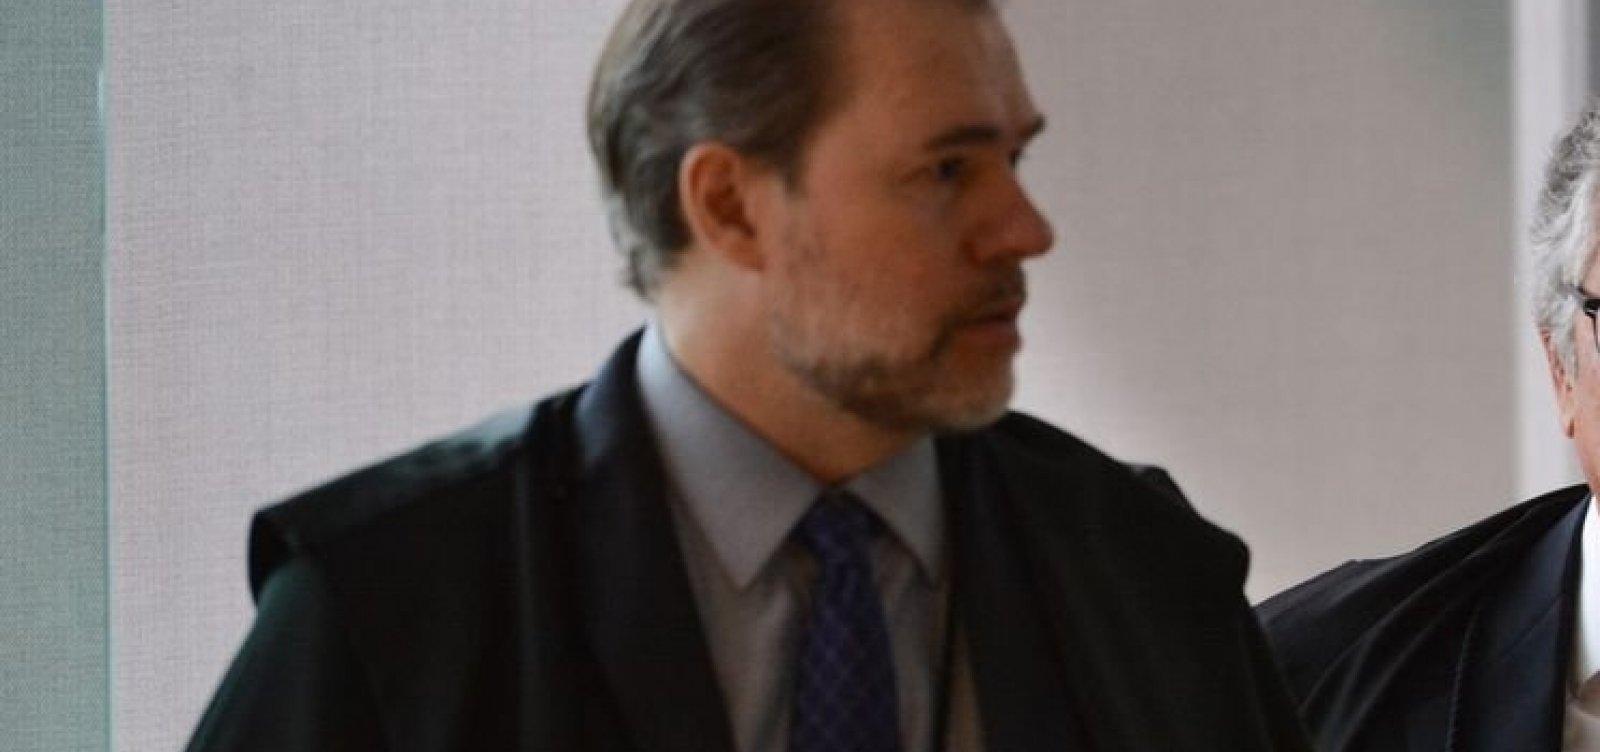 [Toffoli nega analisar recurso contra afastamento do presidente do TJ-BA]